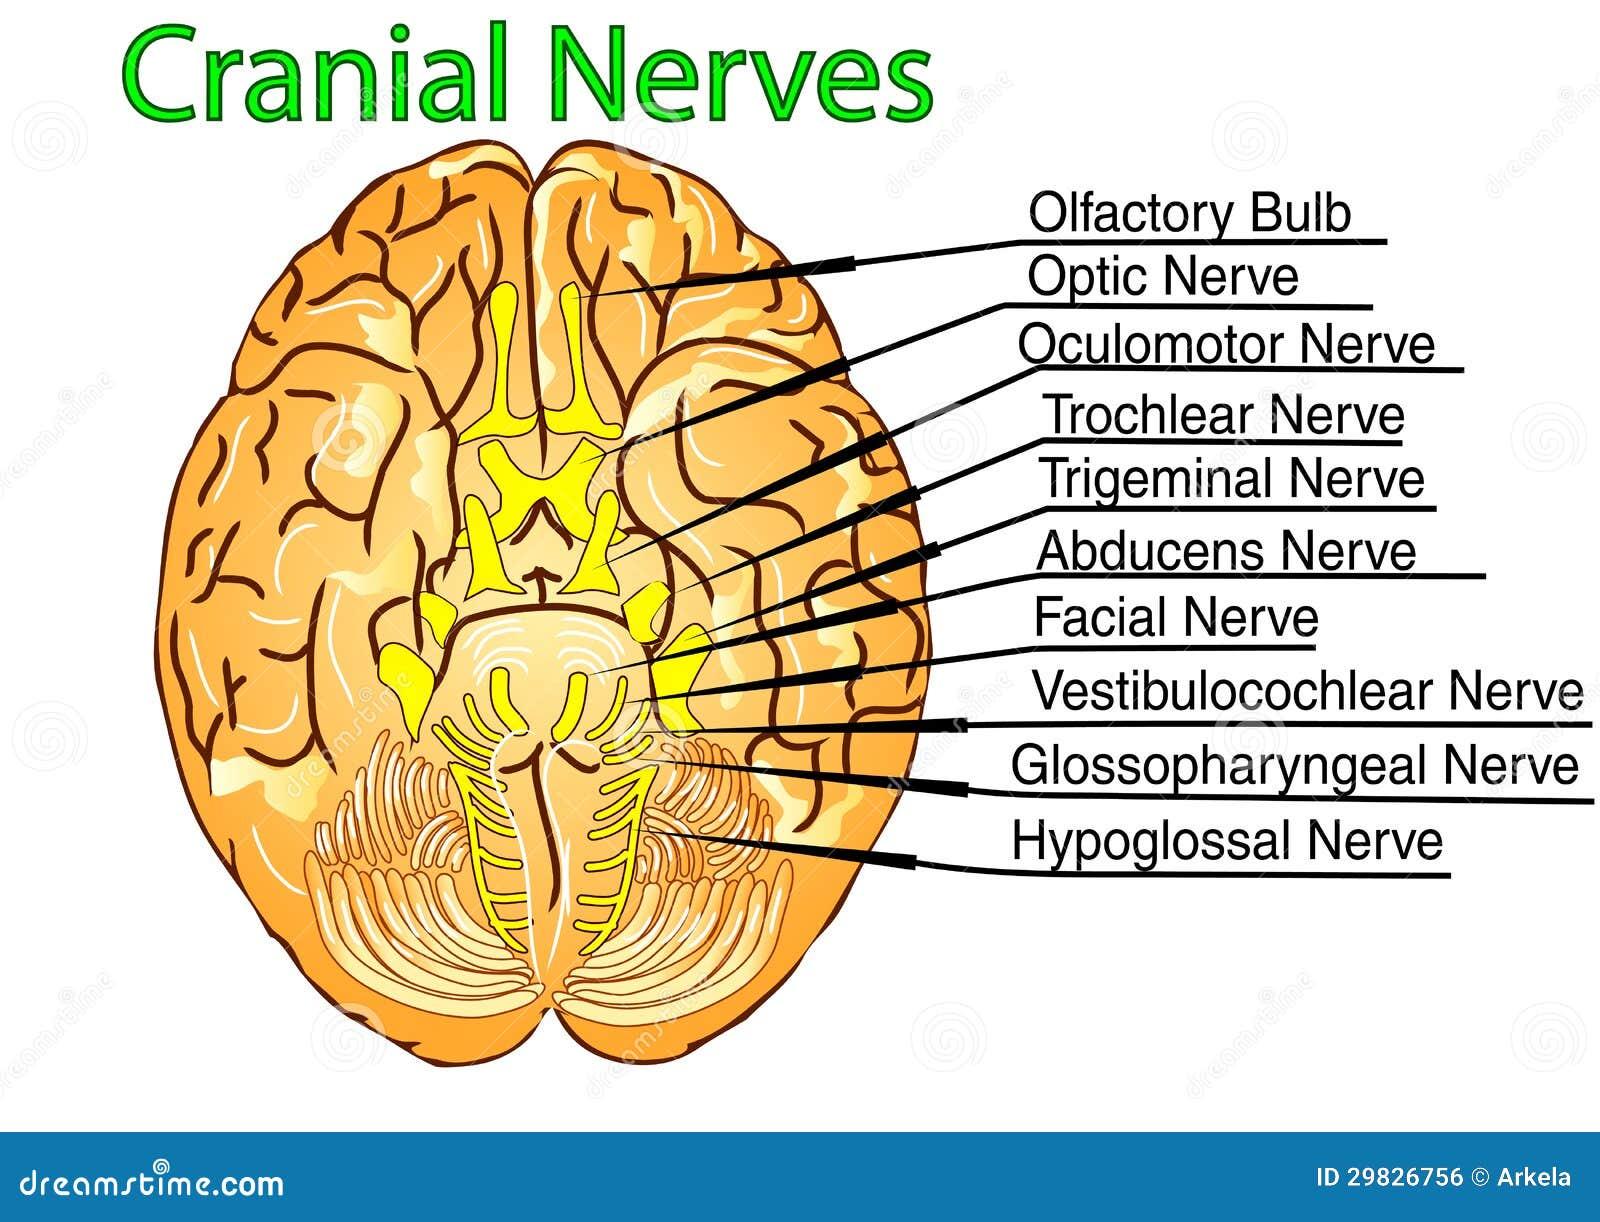 Cranial nerves stock vector. Illustration of cranial - 29826756